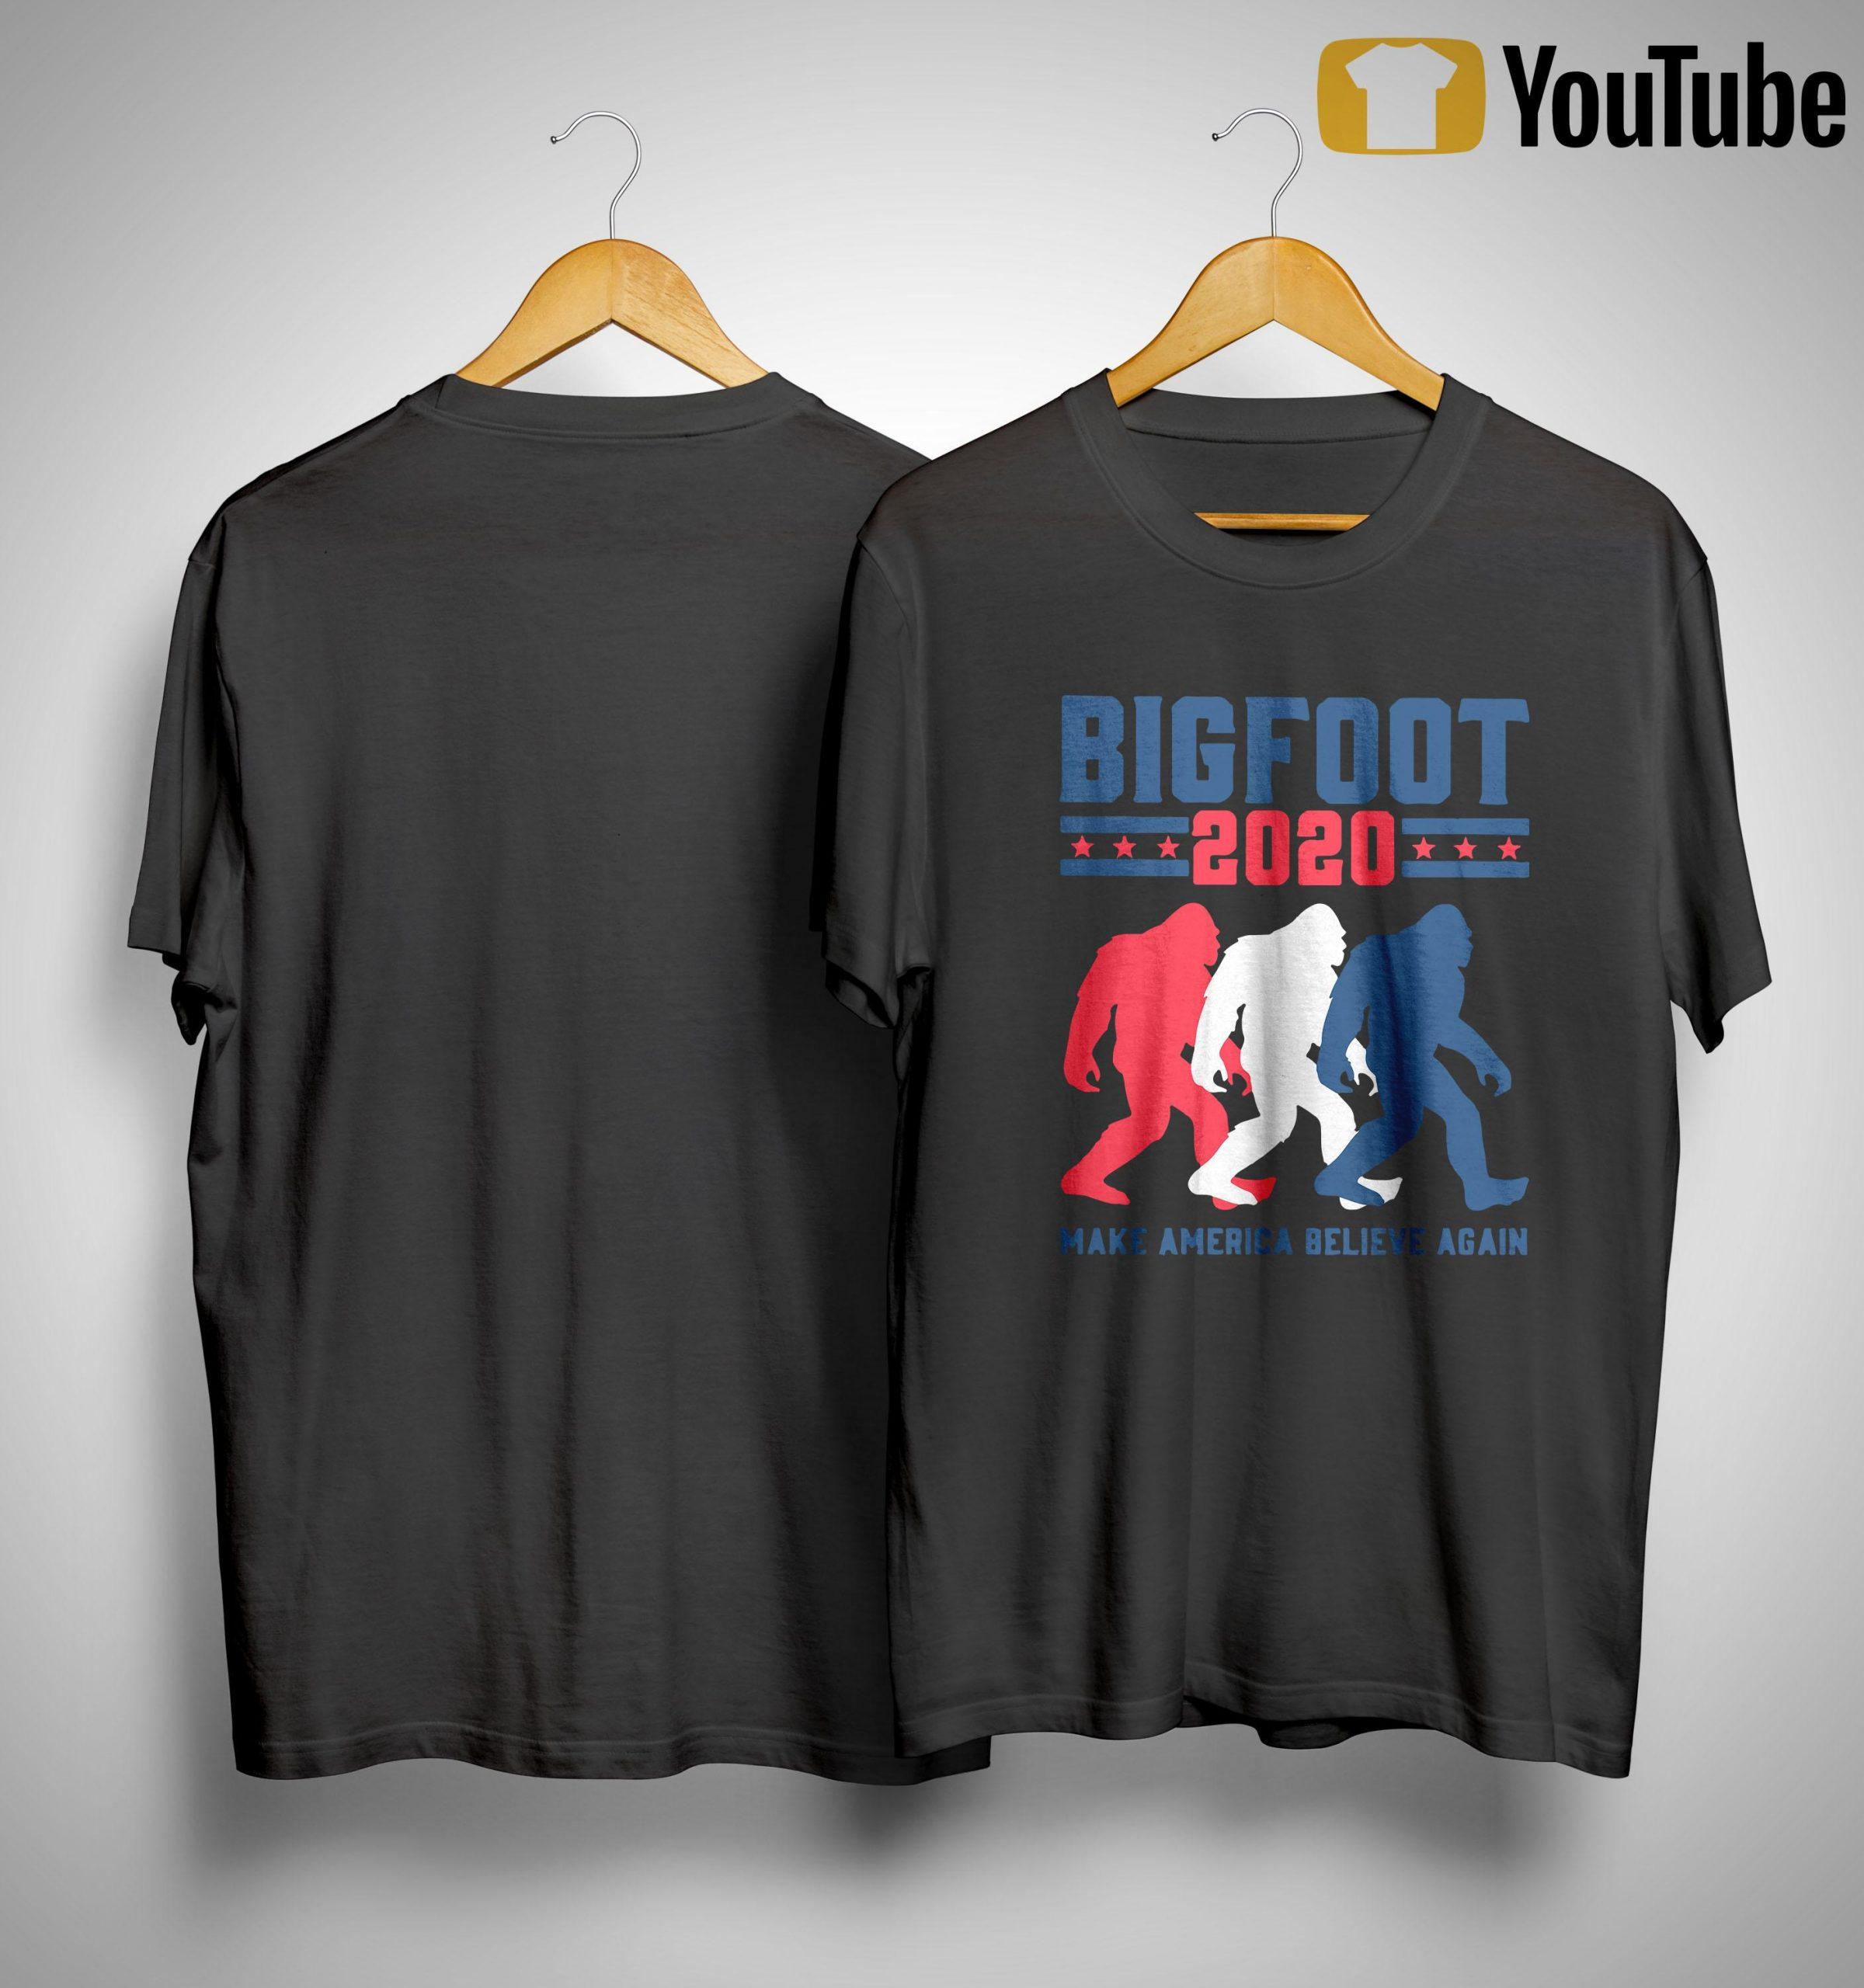 Bigfoot 2020 Make America Believe Again Shirt